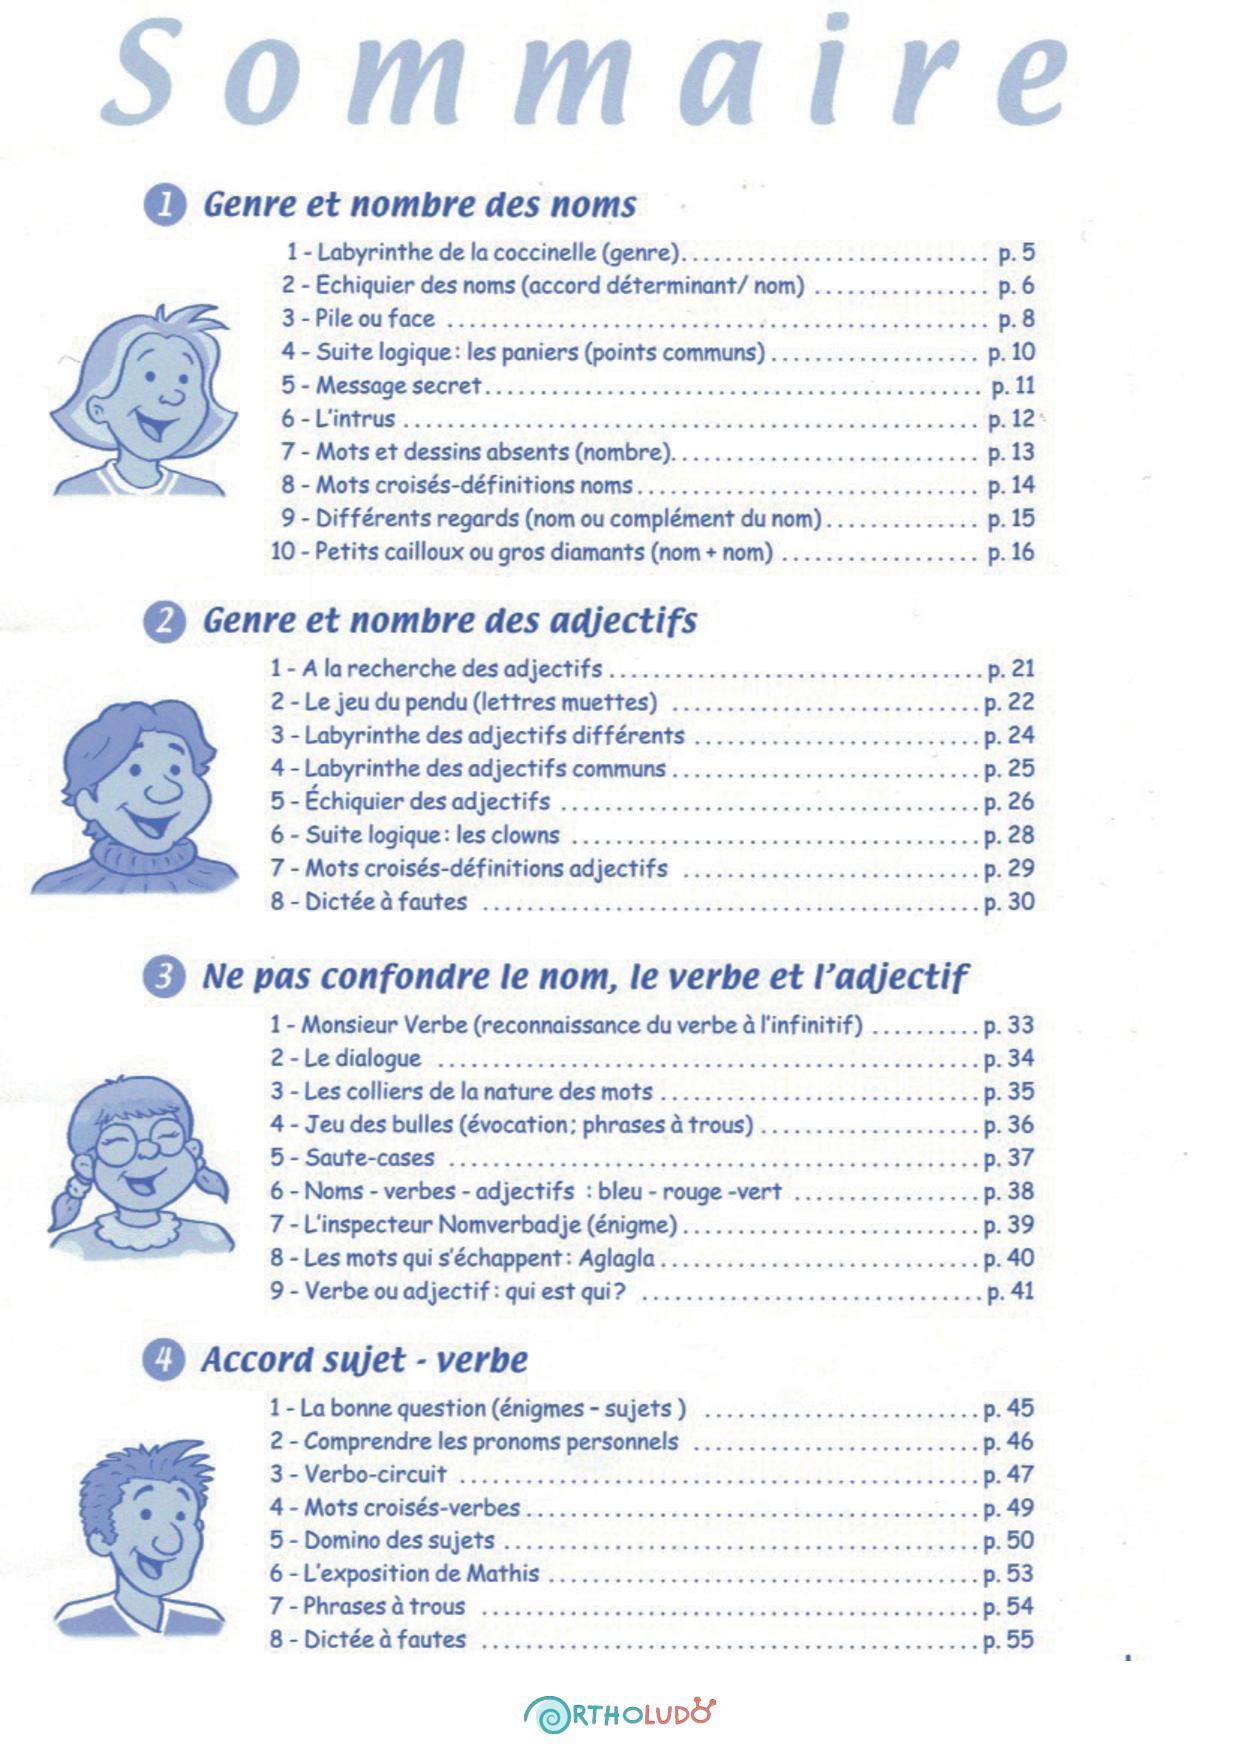 Jeu éducatif - Réflexions grammaticales - photo 2